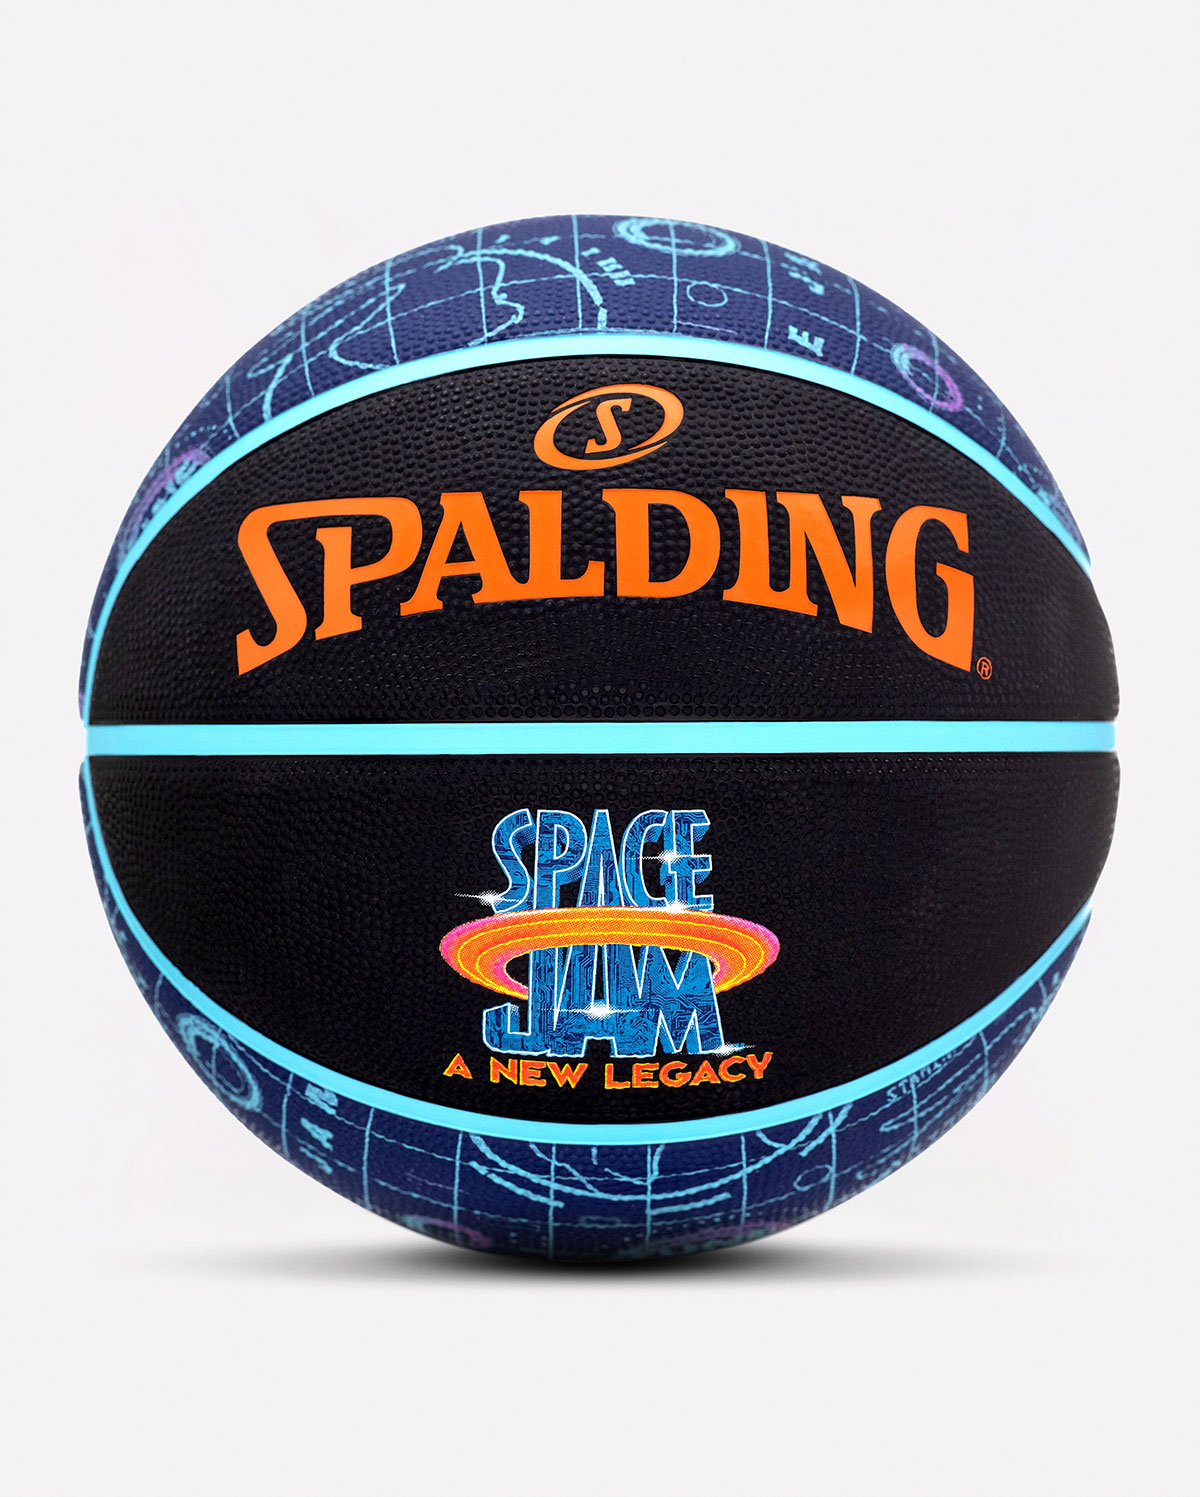 Spalding x Space Jam